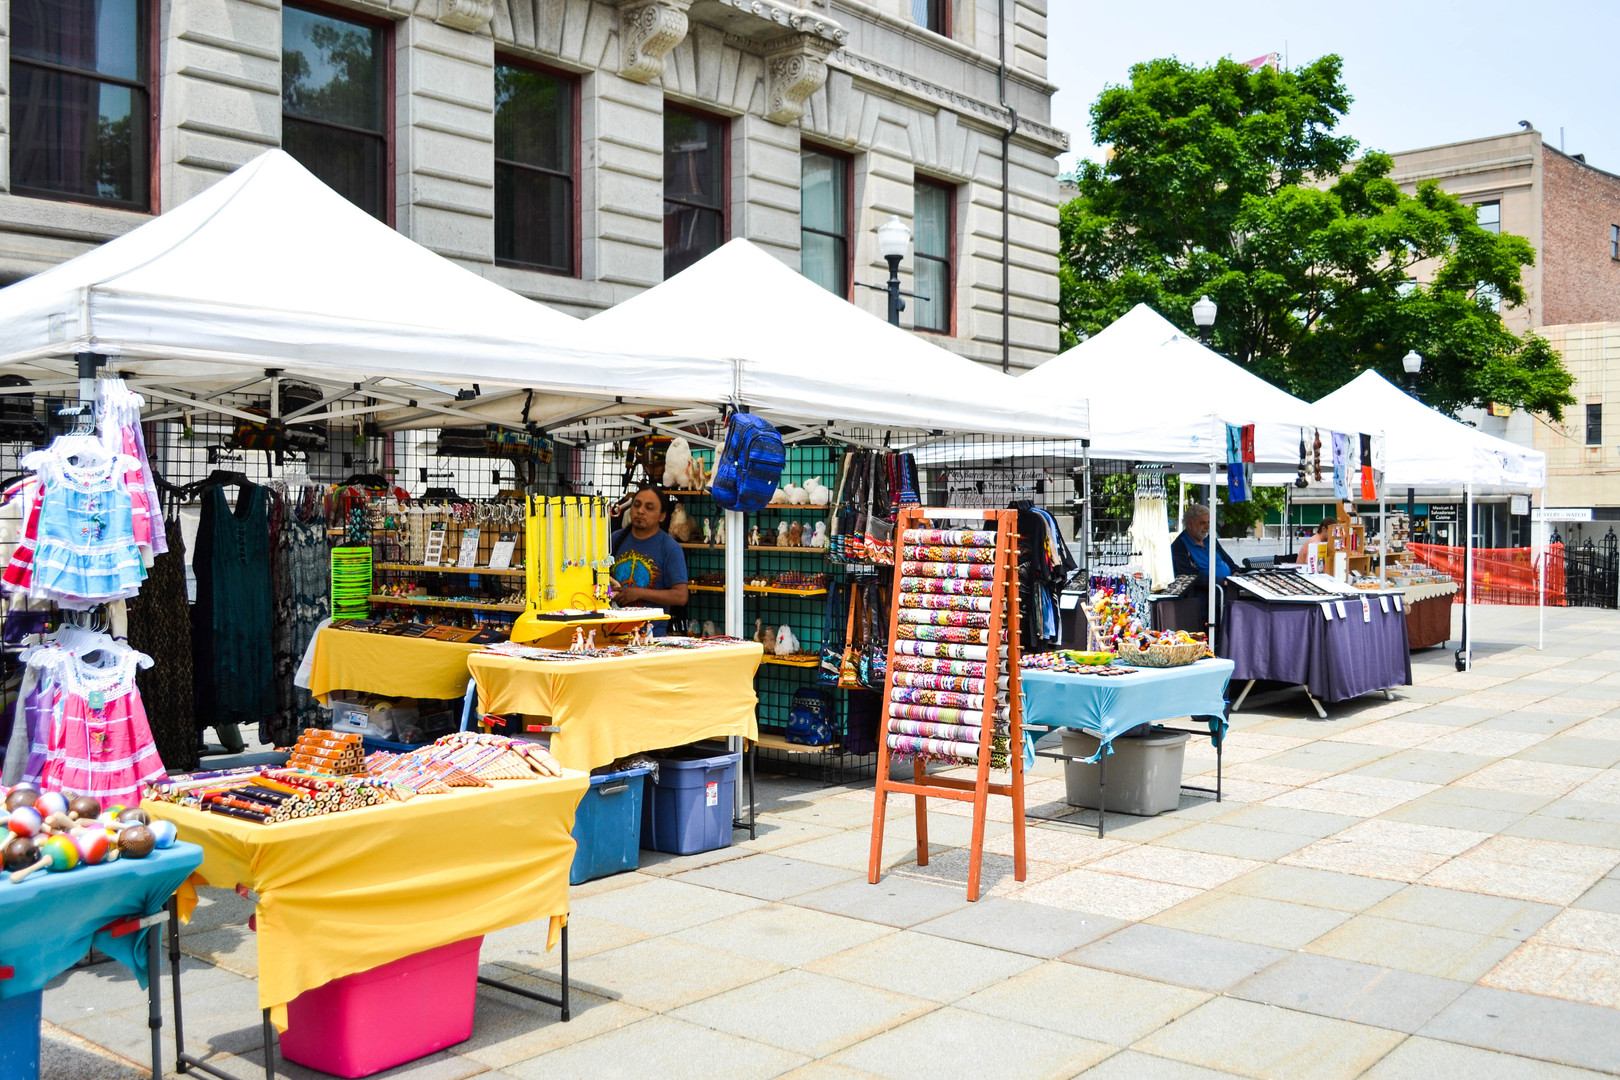 artist market in cape cod.jpg